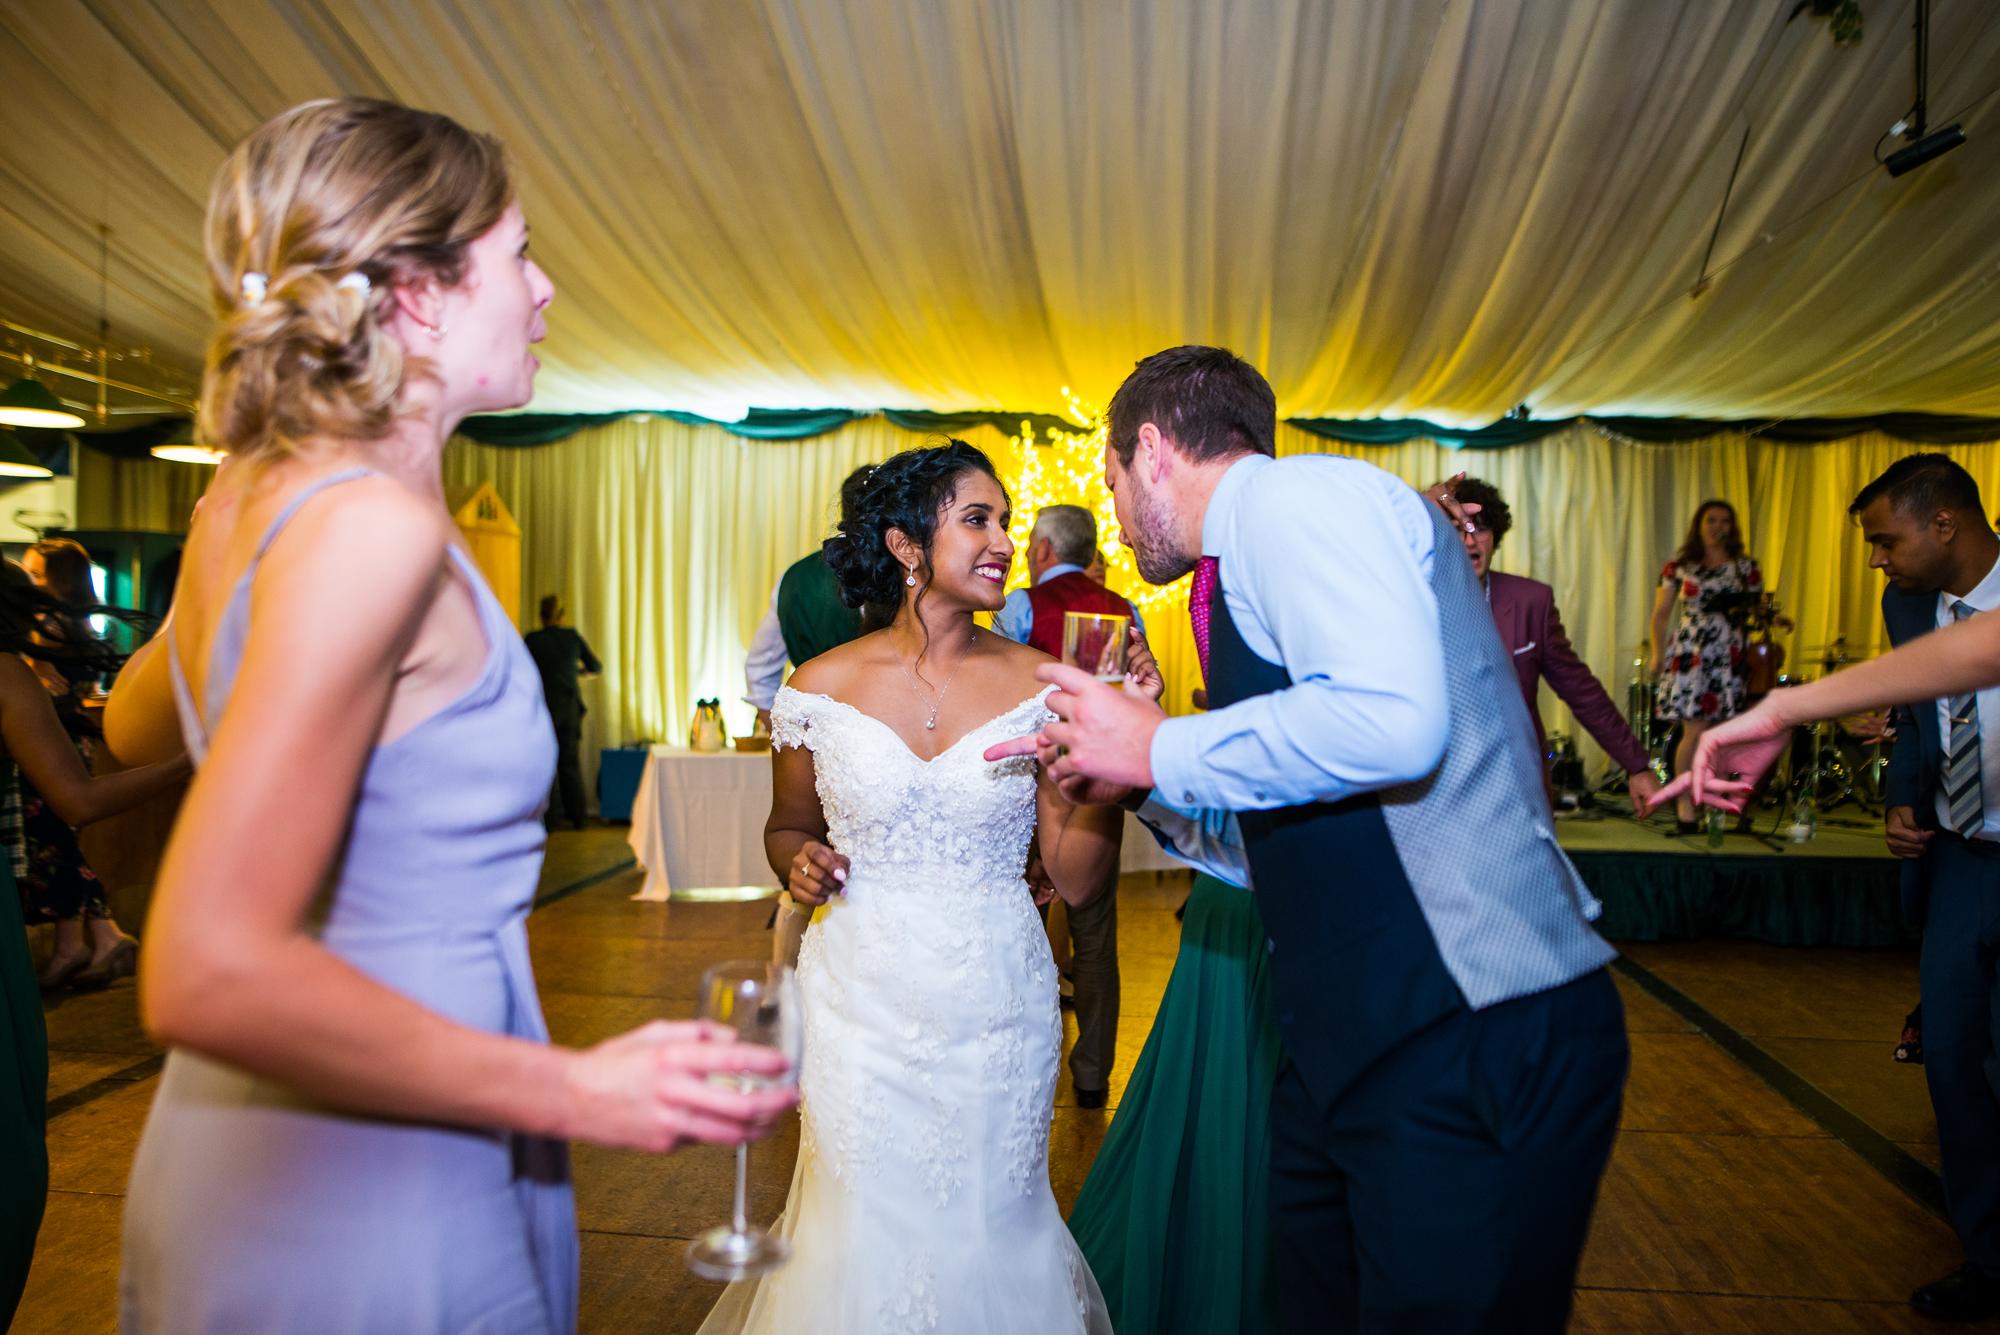 Kev and Shrabani wedding photos (330 of 350).jpg